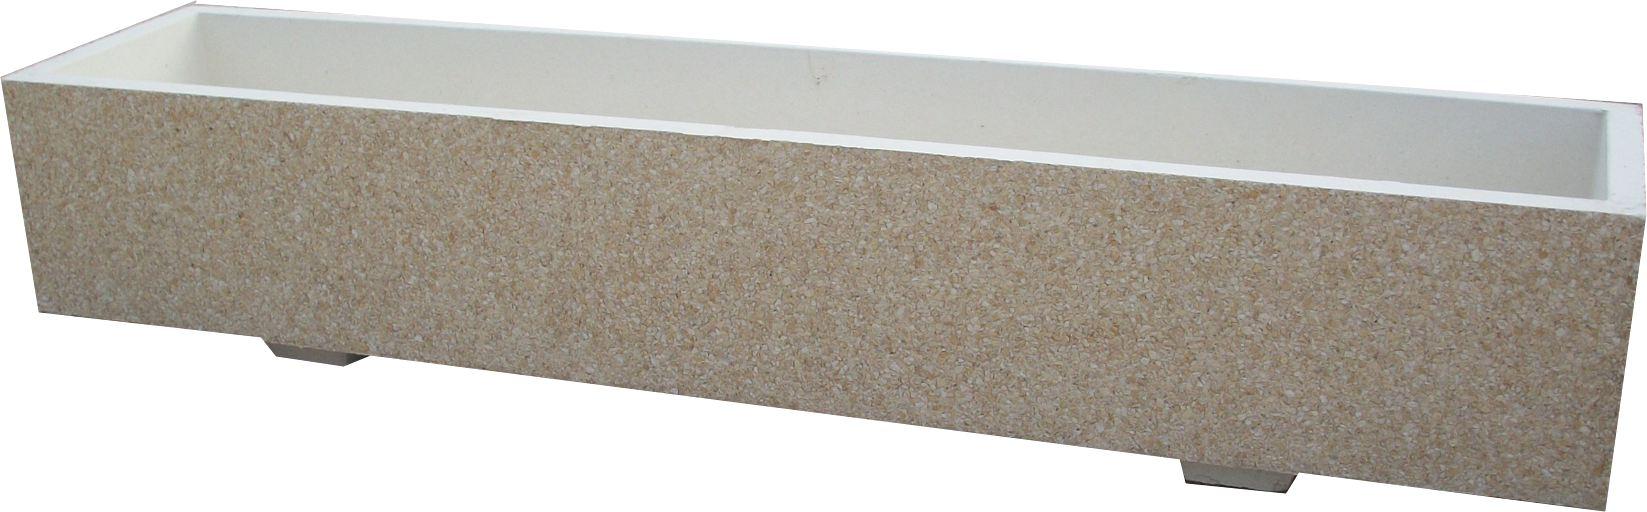 jardiniere rectangulaire beton devis